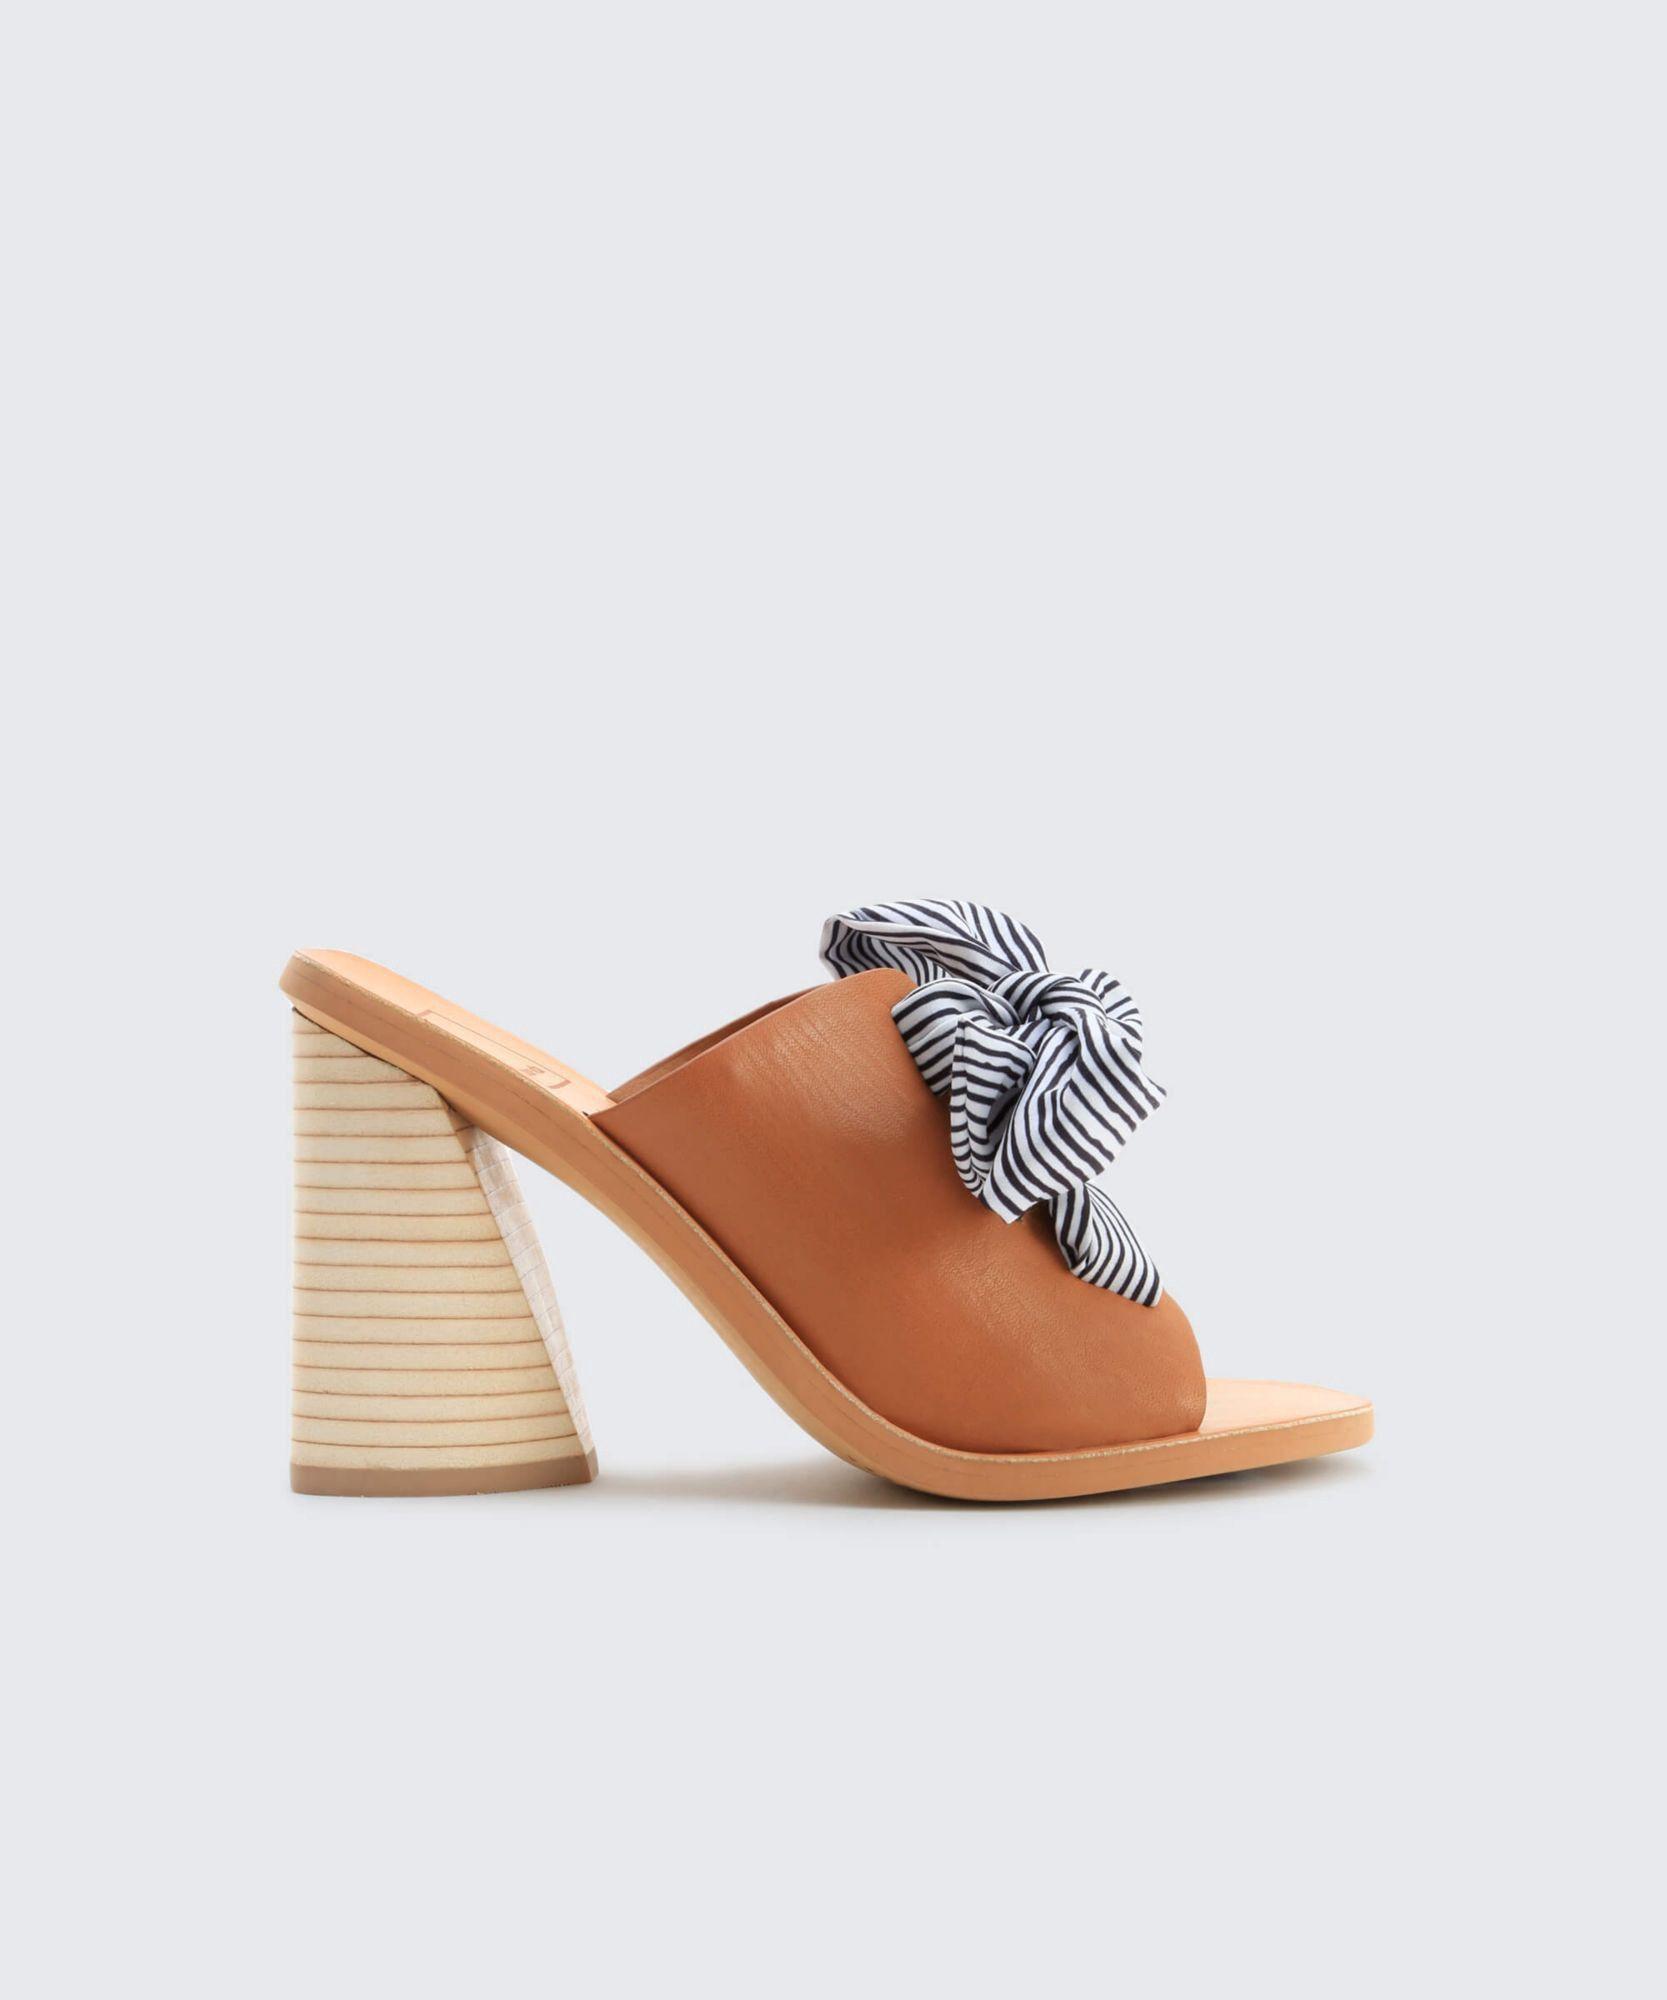 f9982a161512 Dolce Vita Amber Heels - Caramel 9.5